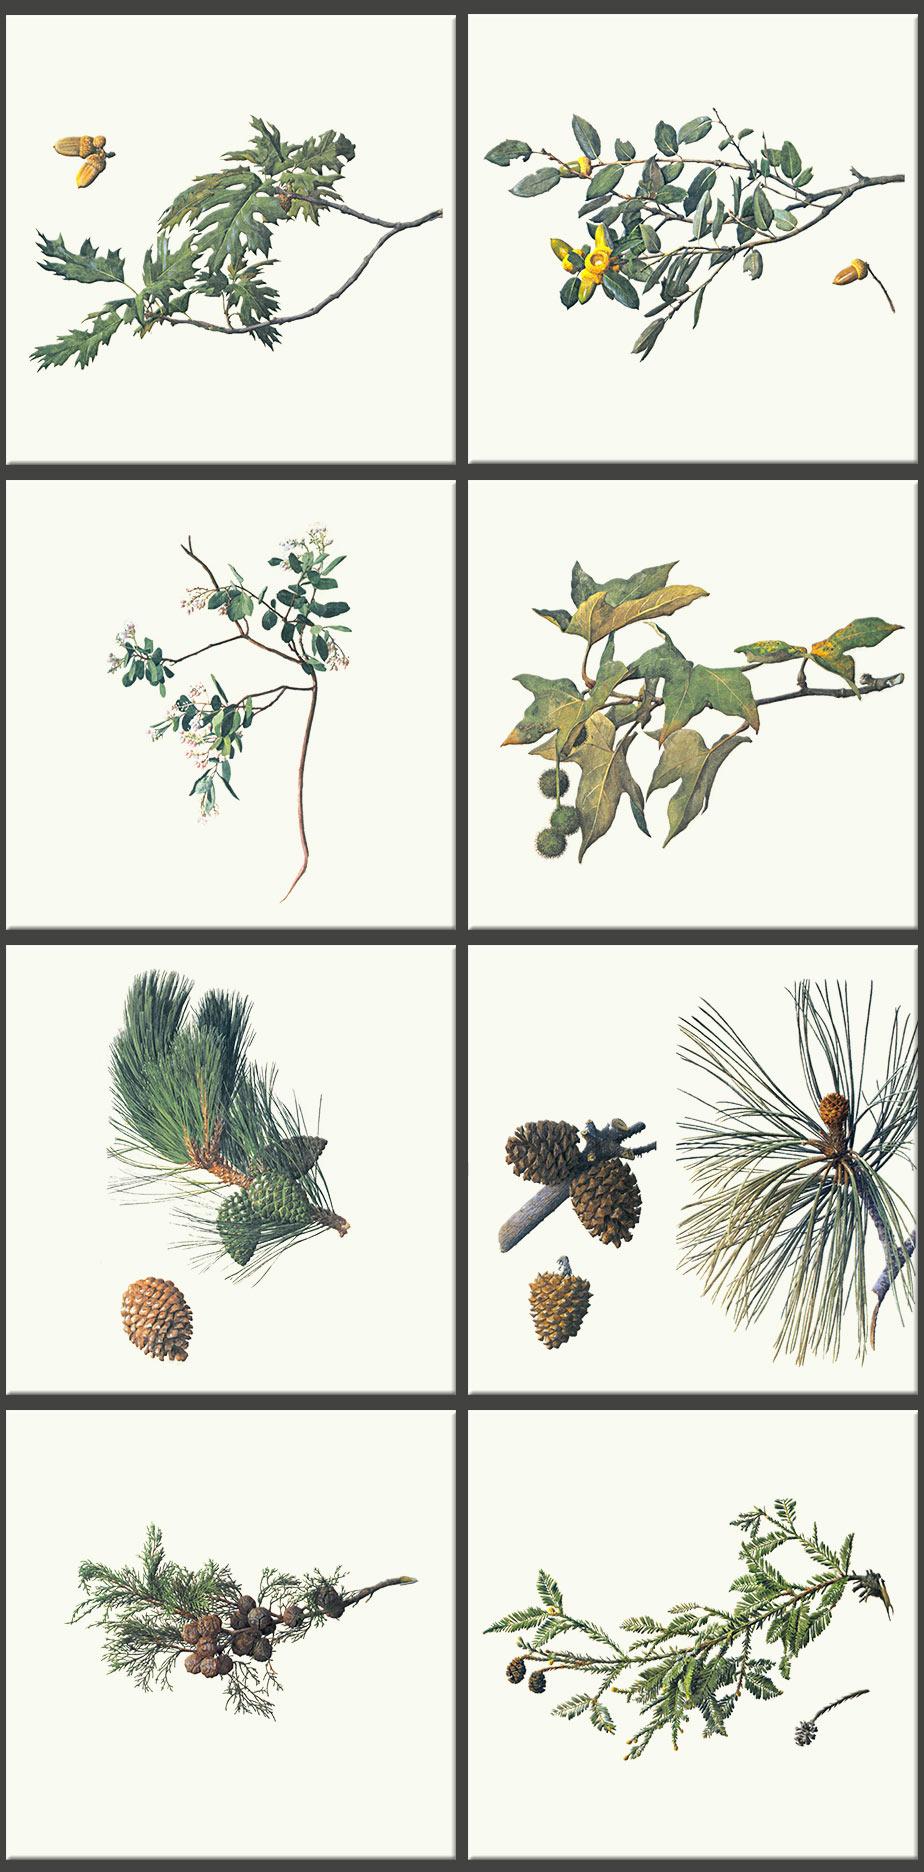 From top left: California black oak, Canyon live oak, Brush manzanita, California Sycamore, Monterey pine, Santa Rosa Island Torrey pine, Monterey Cypress, Coast redwood